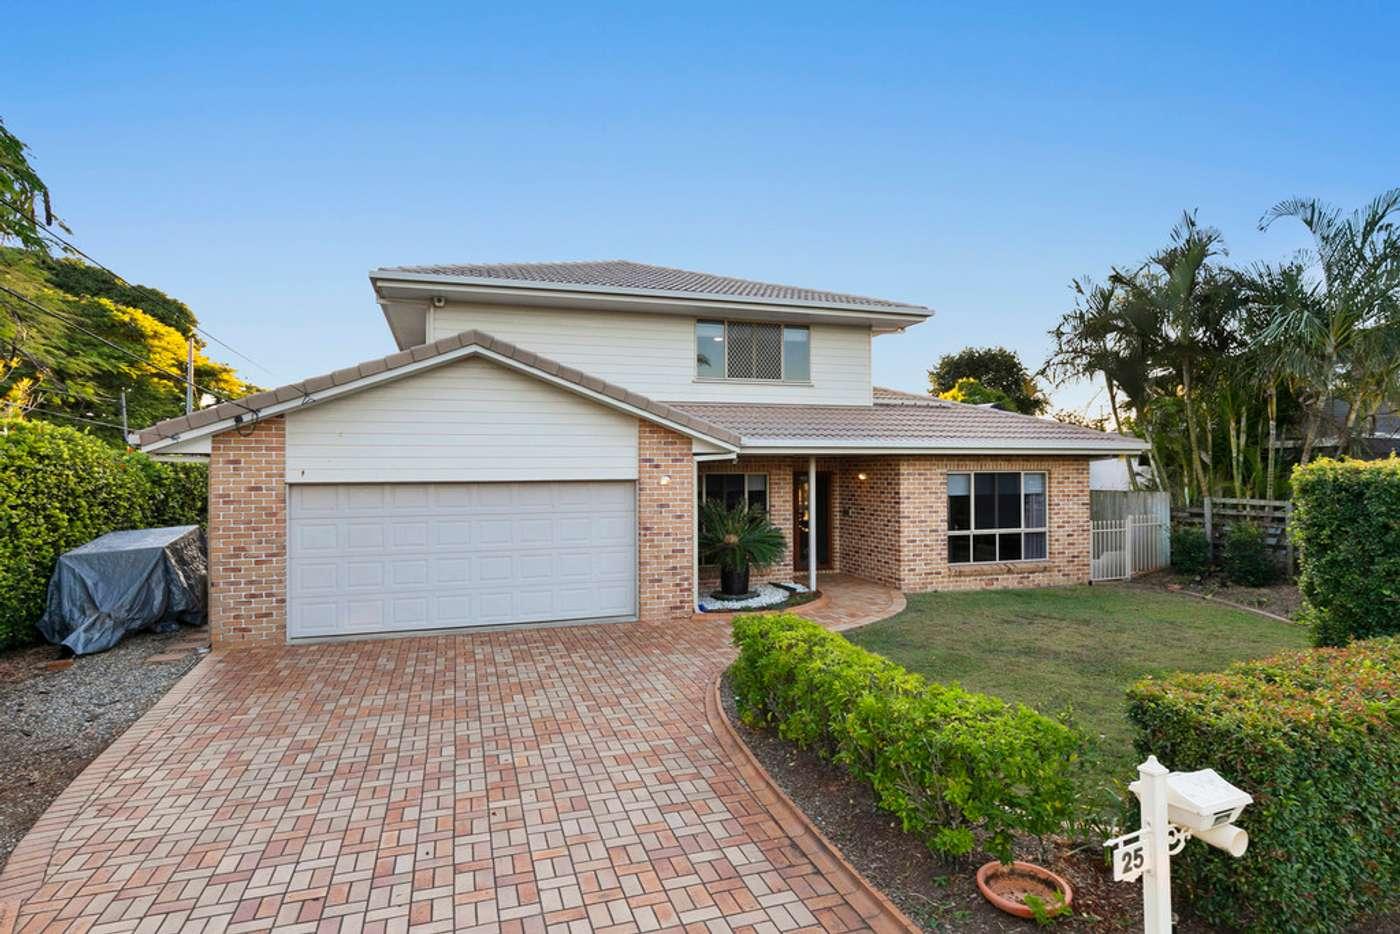 Main view of Homely house listing, 25 Greggor Street, Wynnum West QLD 4178